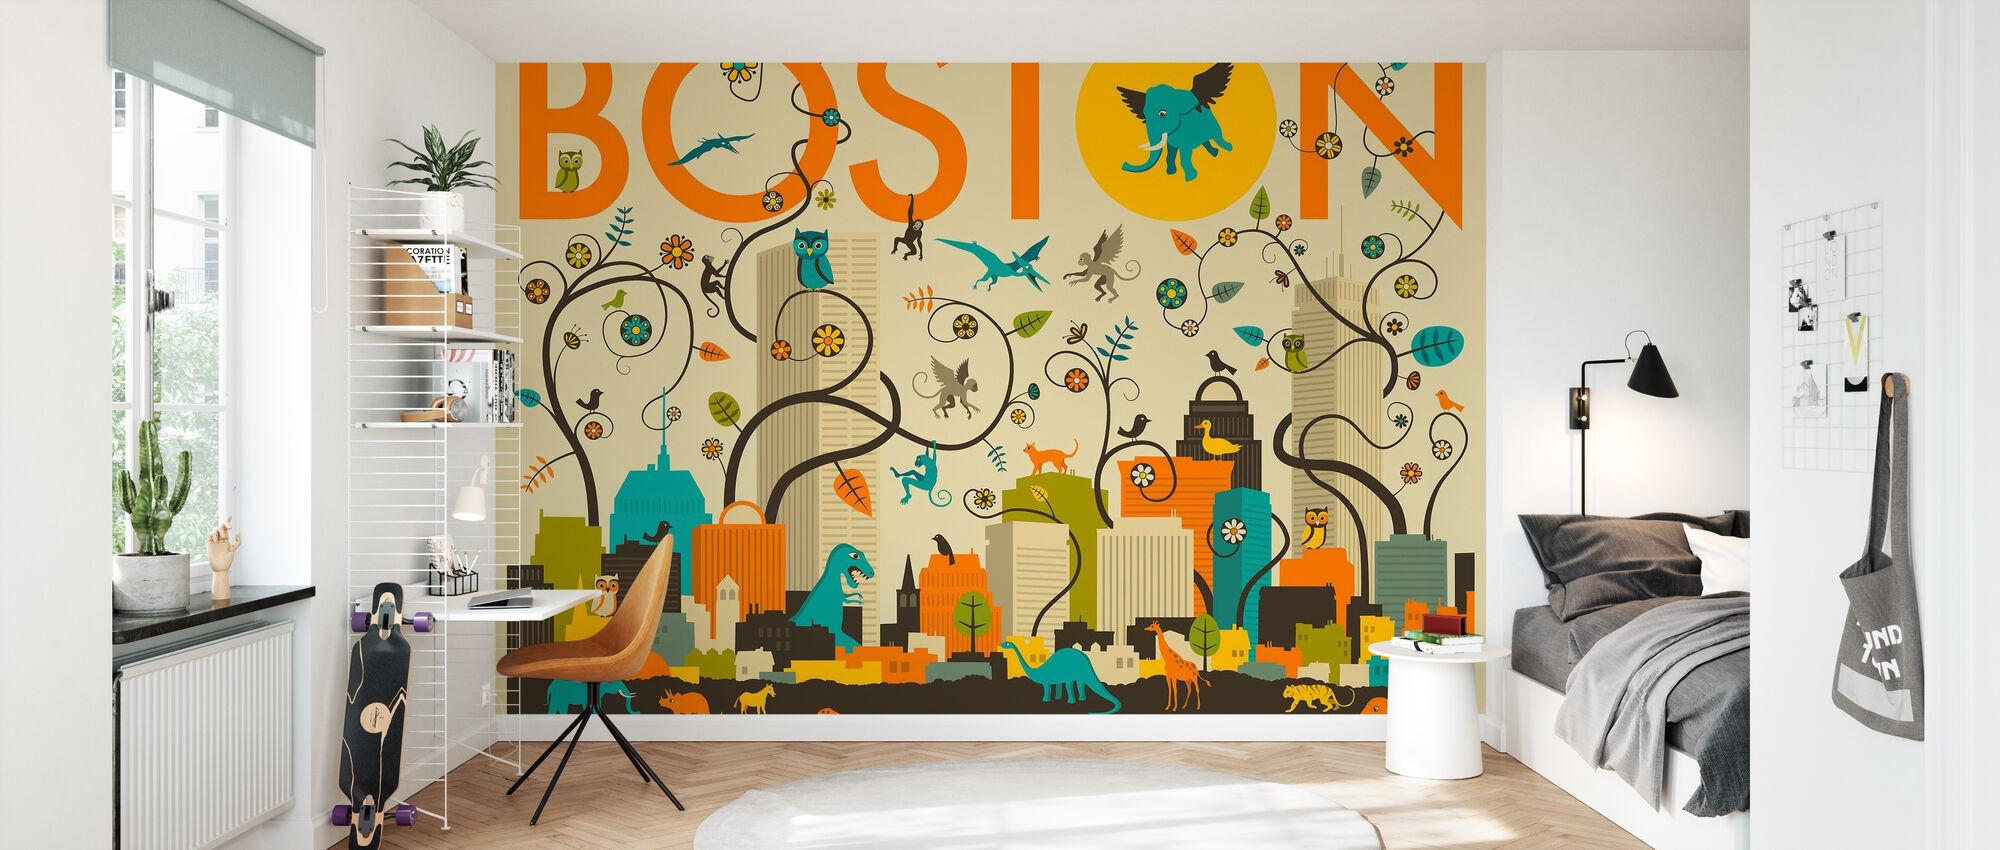 Boston Dyr - Tapet - Børneværelse